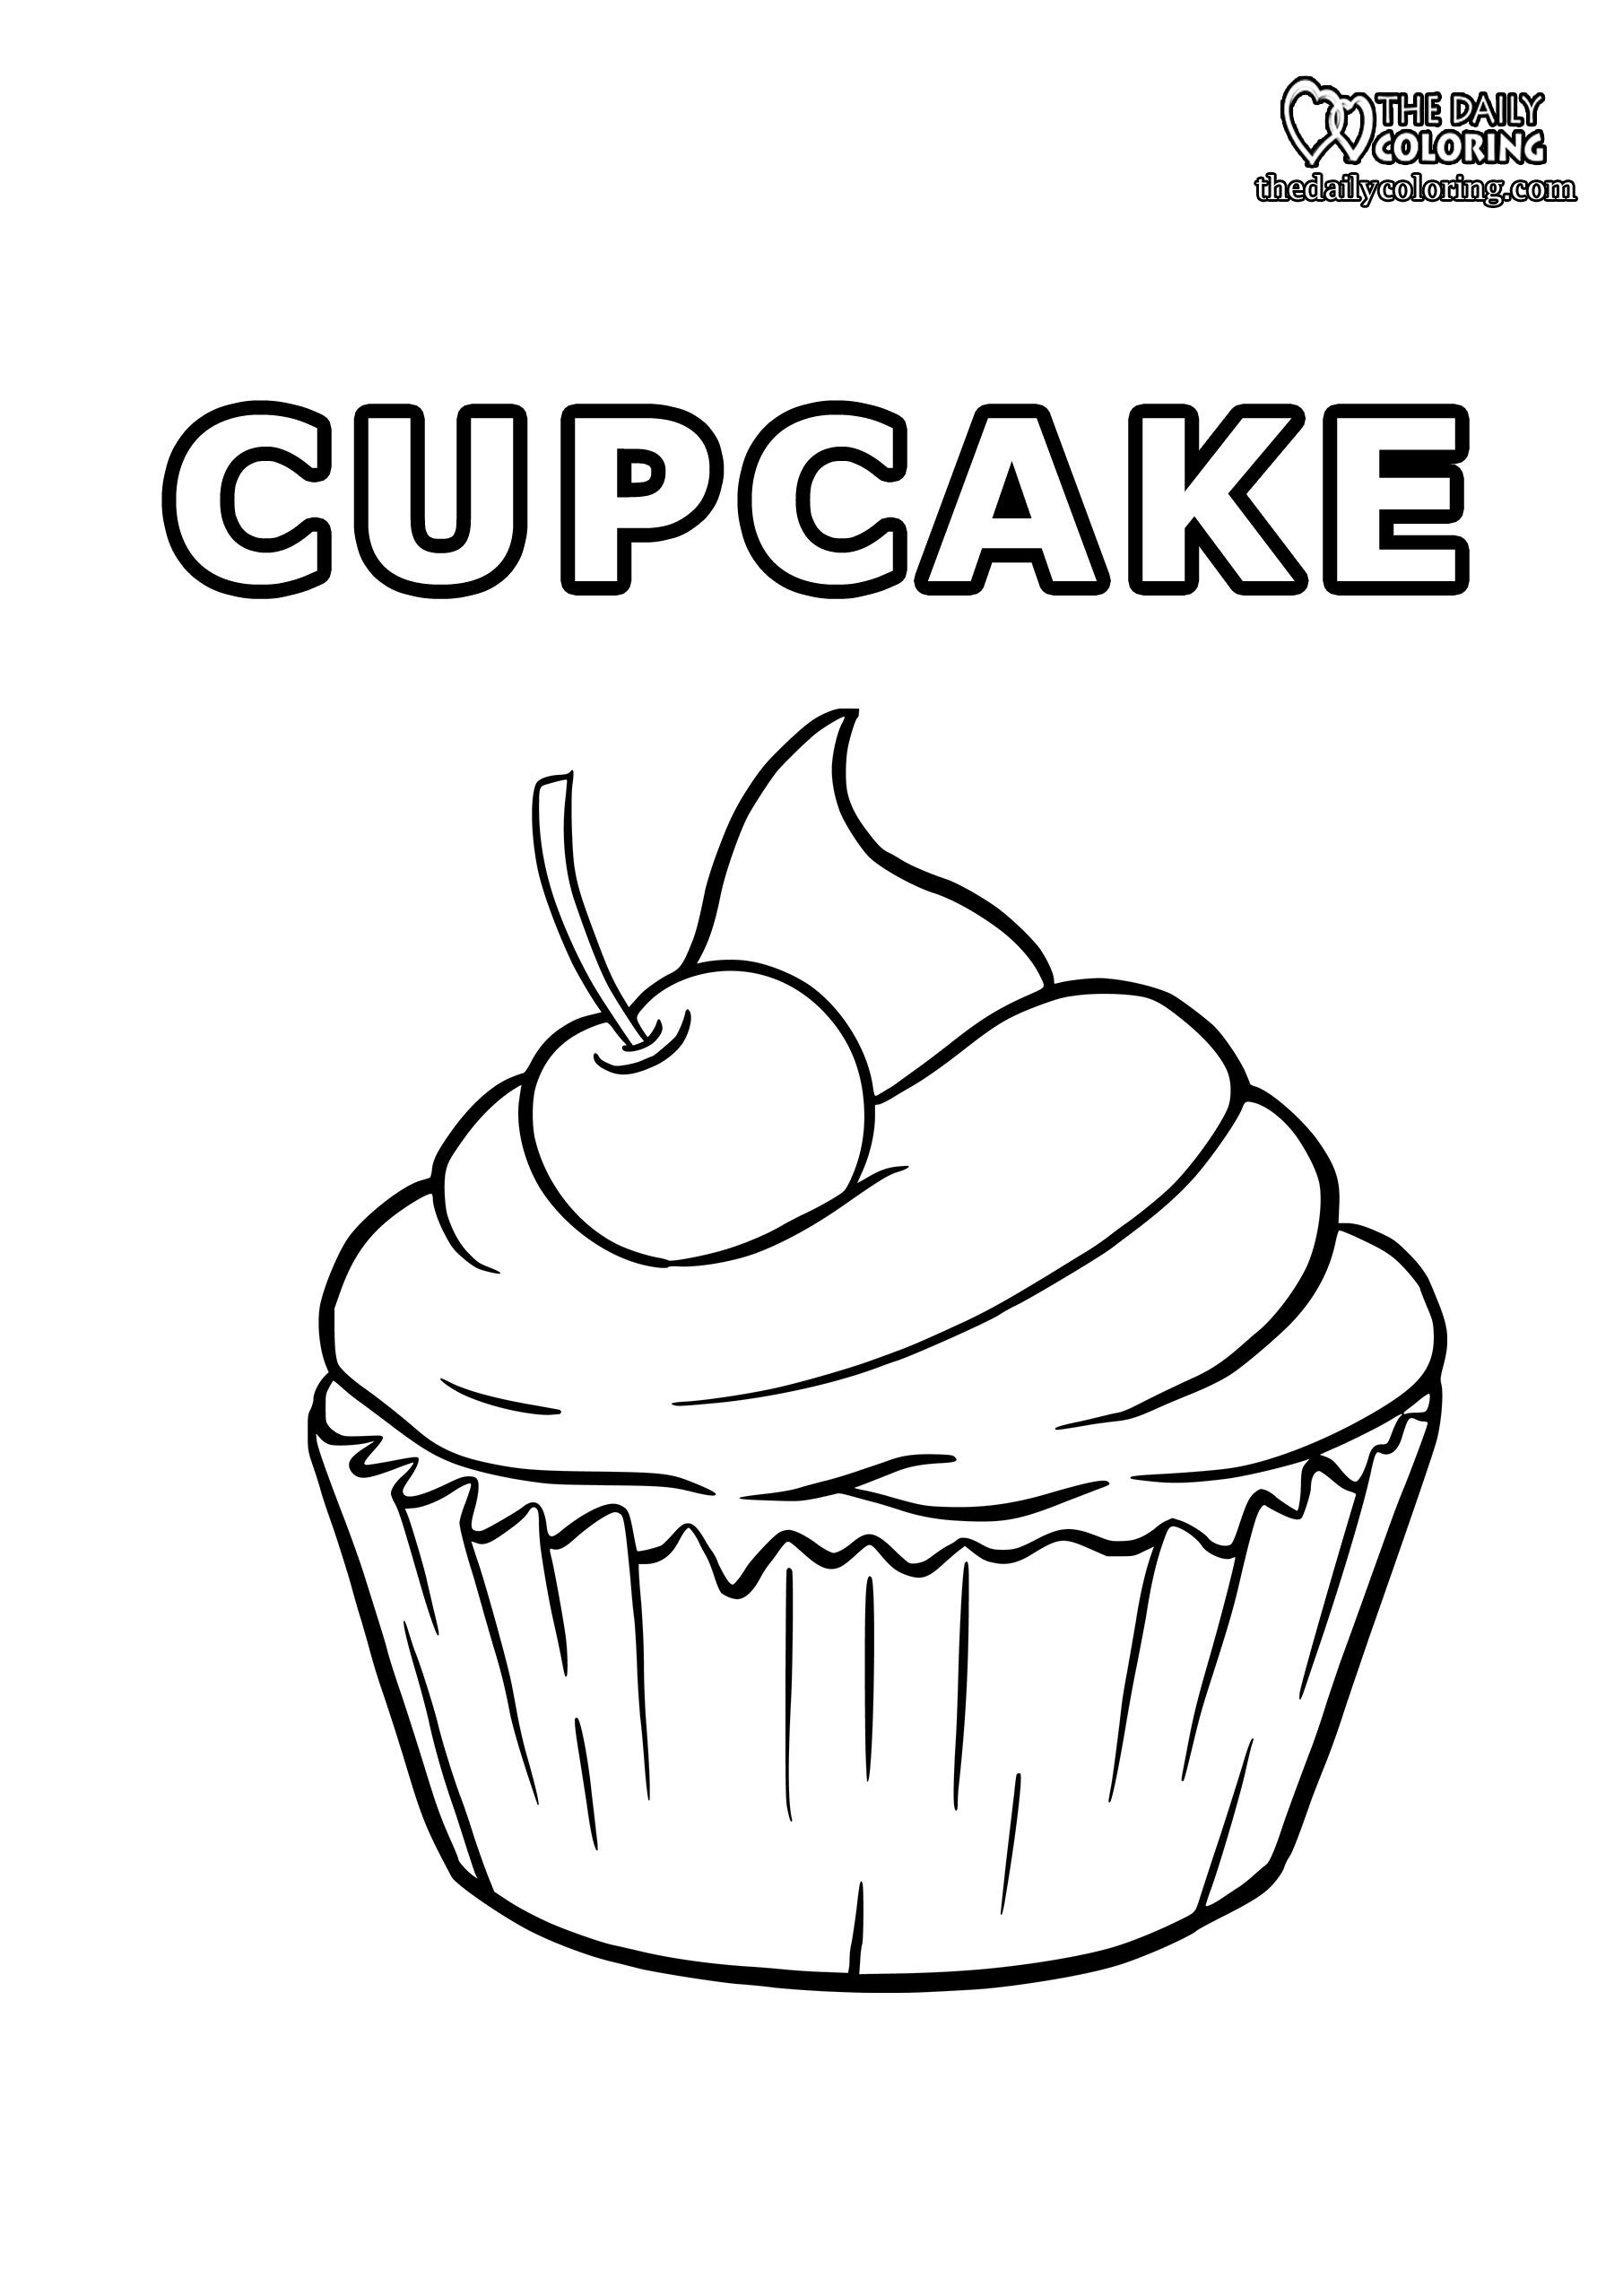 cupcake-coloring-page